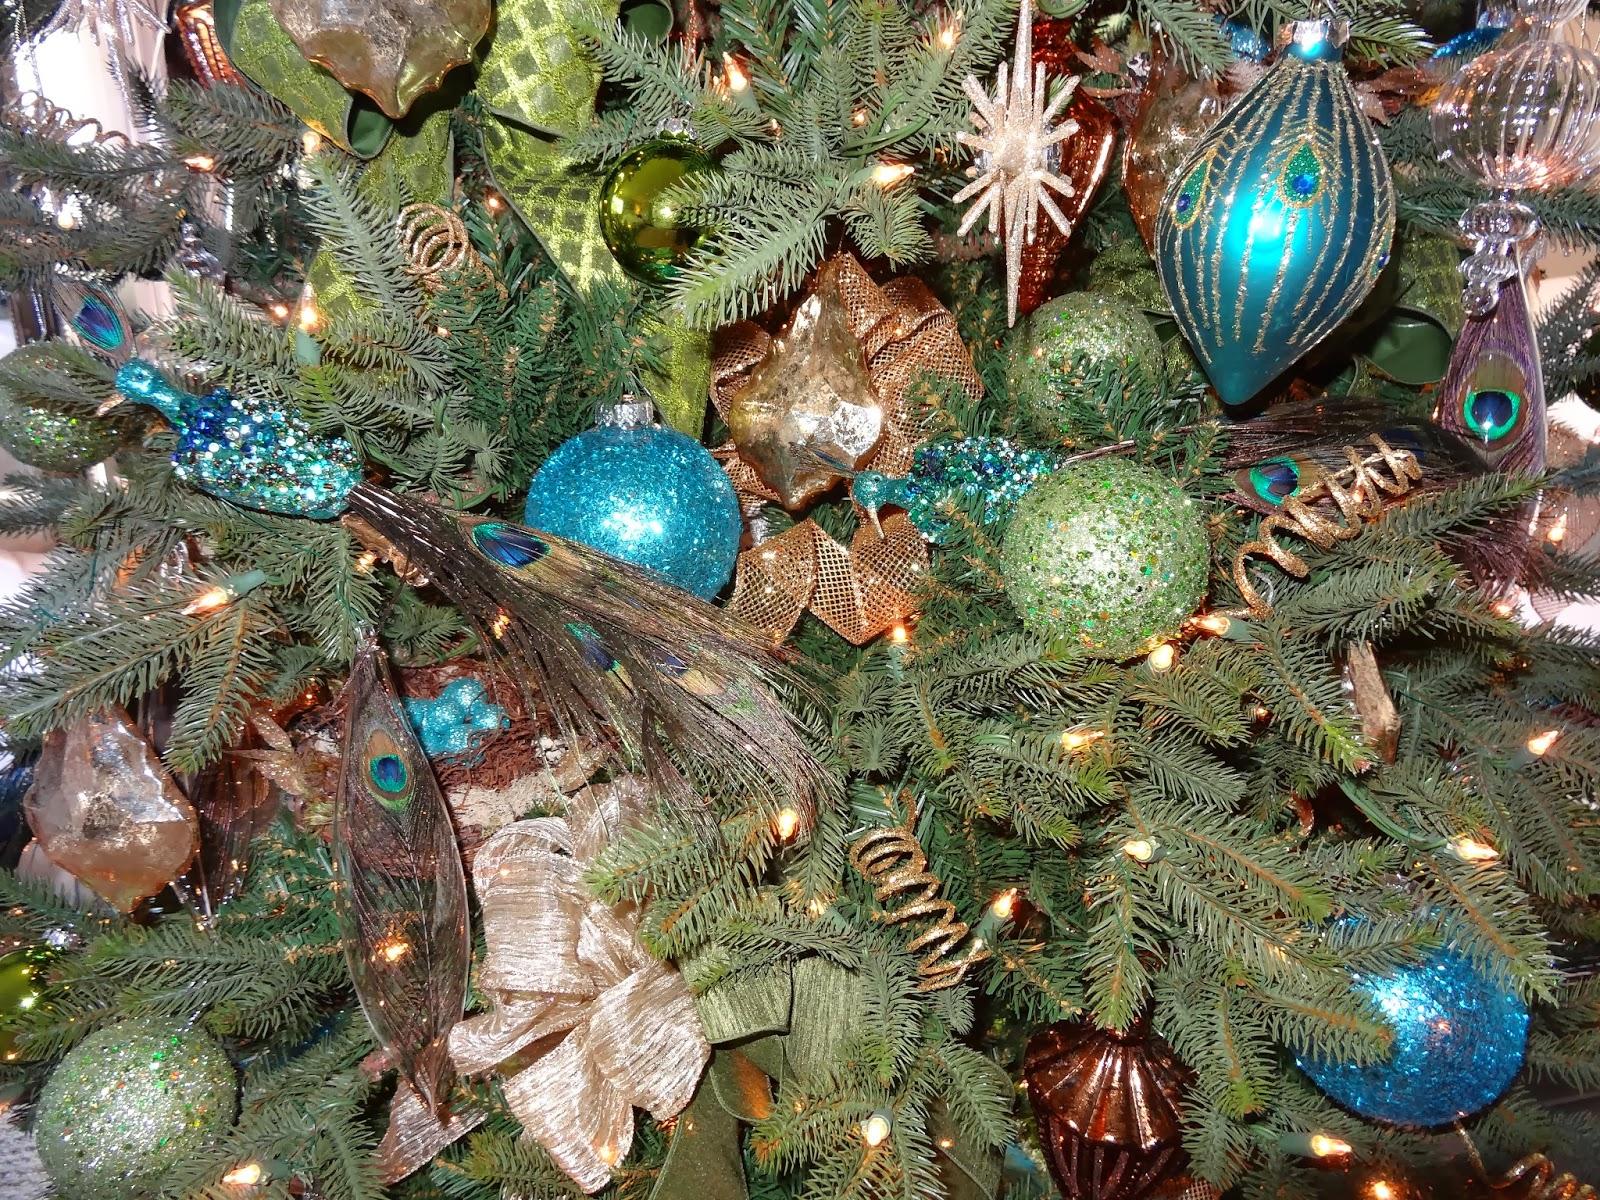 Seahorse & Stripes: Vintage Glam Peacock Christmas Tree